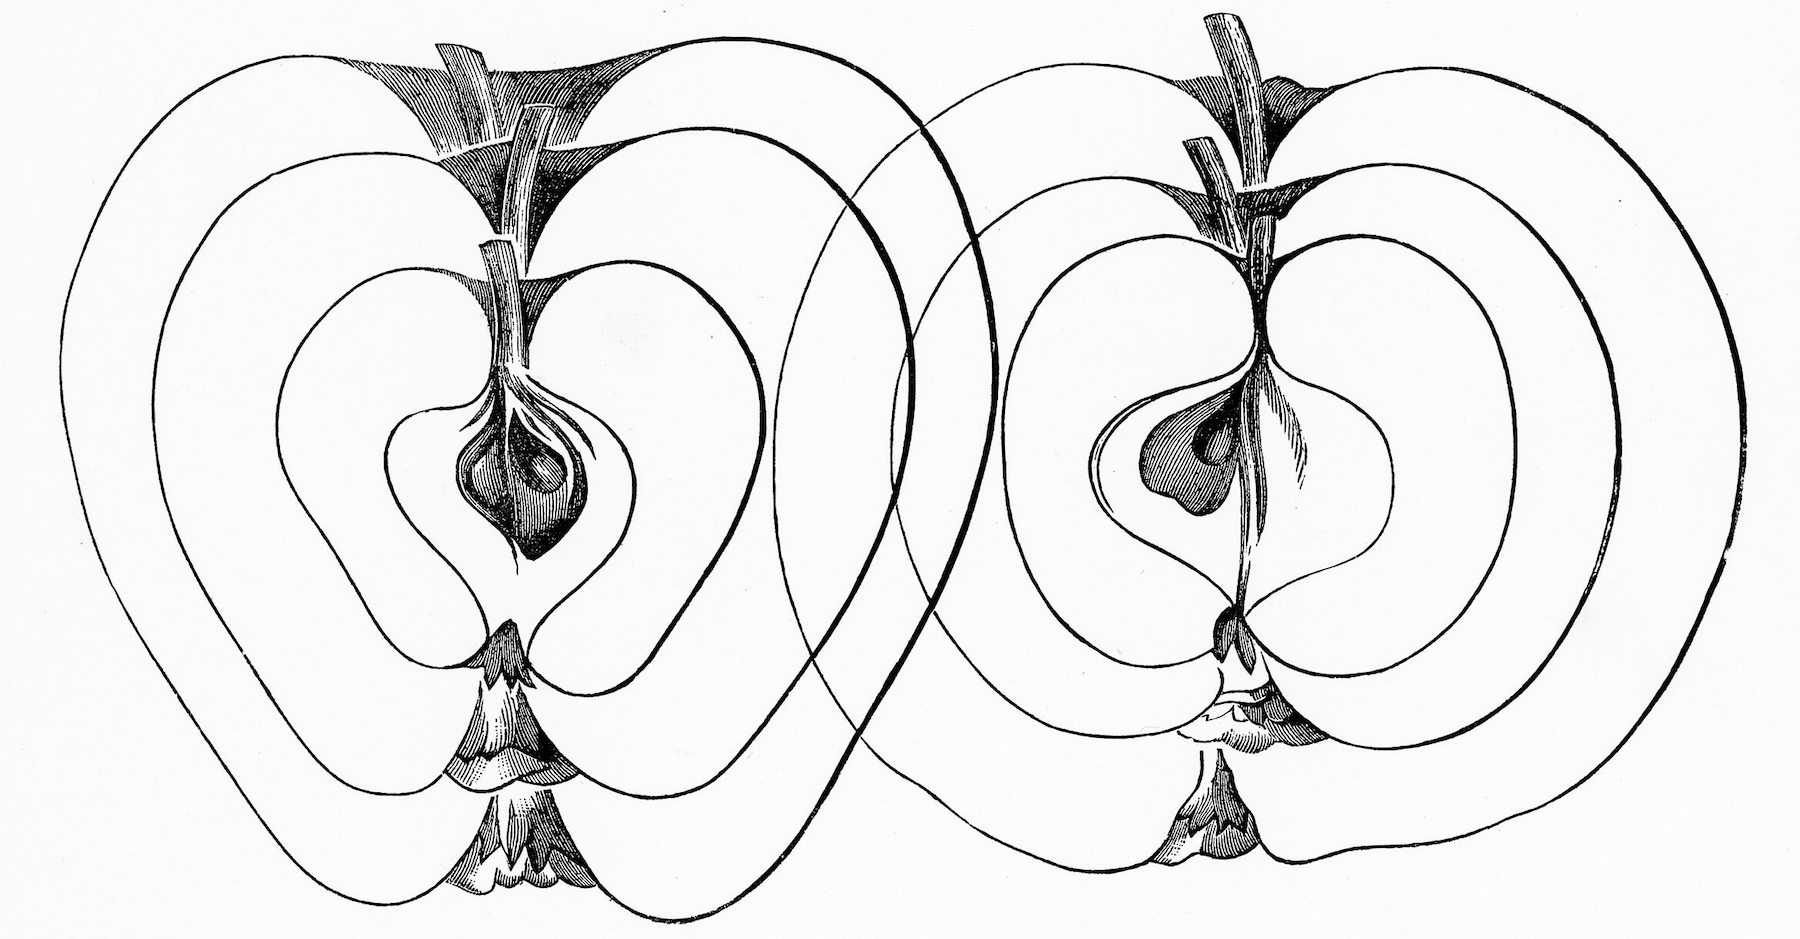 Bild: The fruit grower's guide : Vintage illustration of apples, shapes, sizeshttps://www.rawpixel.com/image/50953/free-illustration-image-apples-cc0-creative-commons URL: